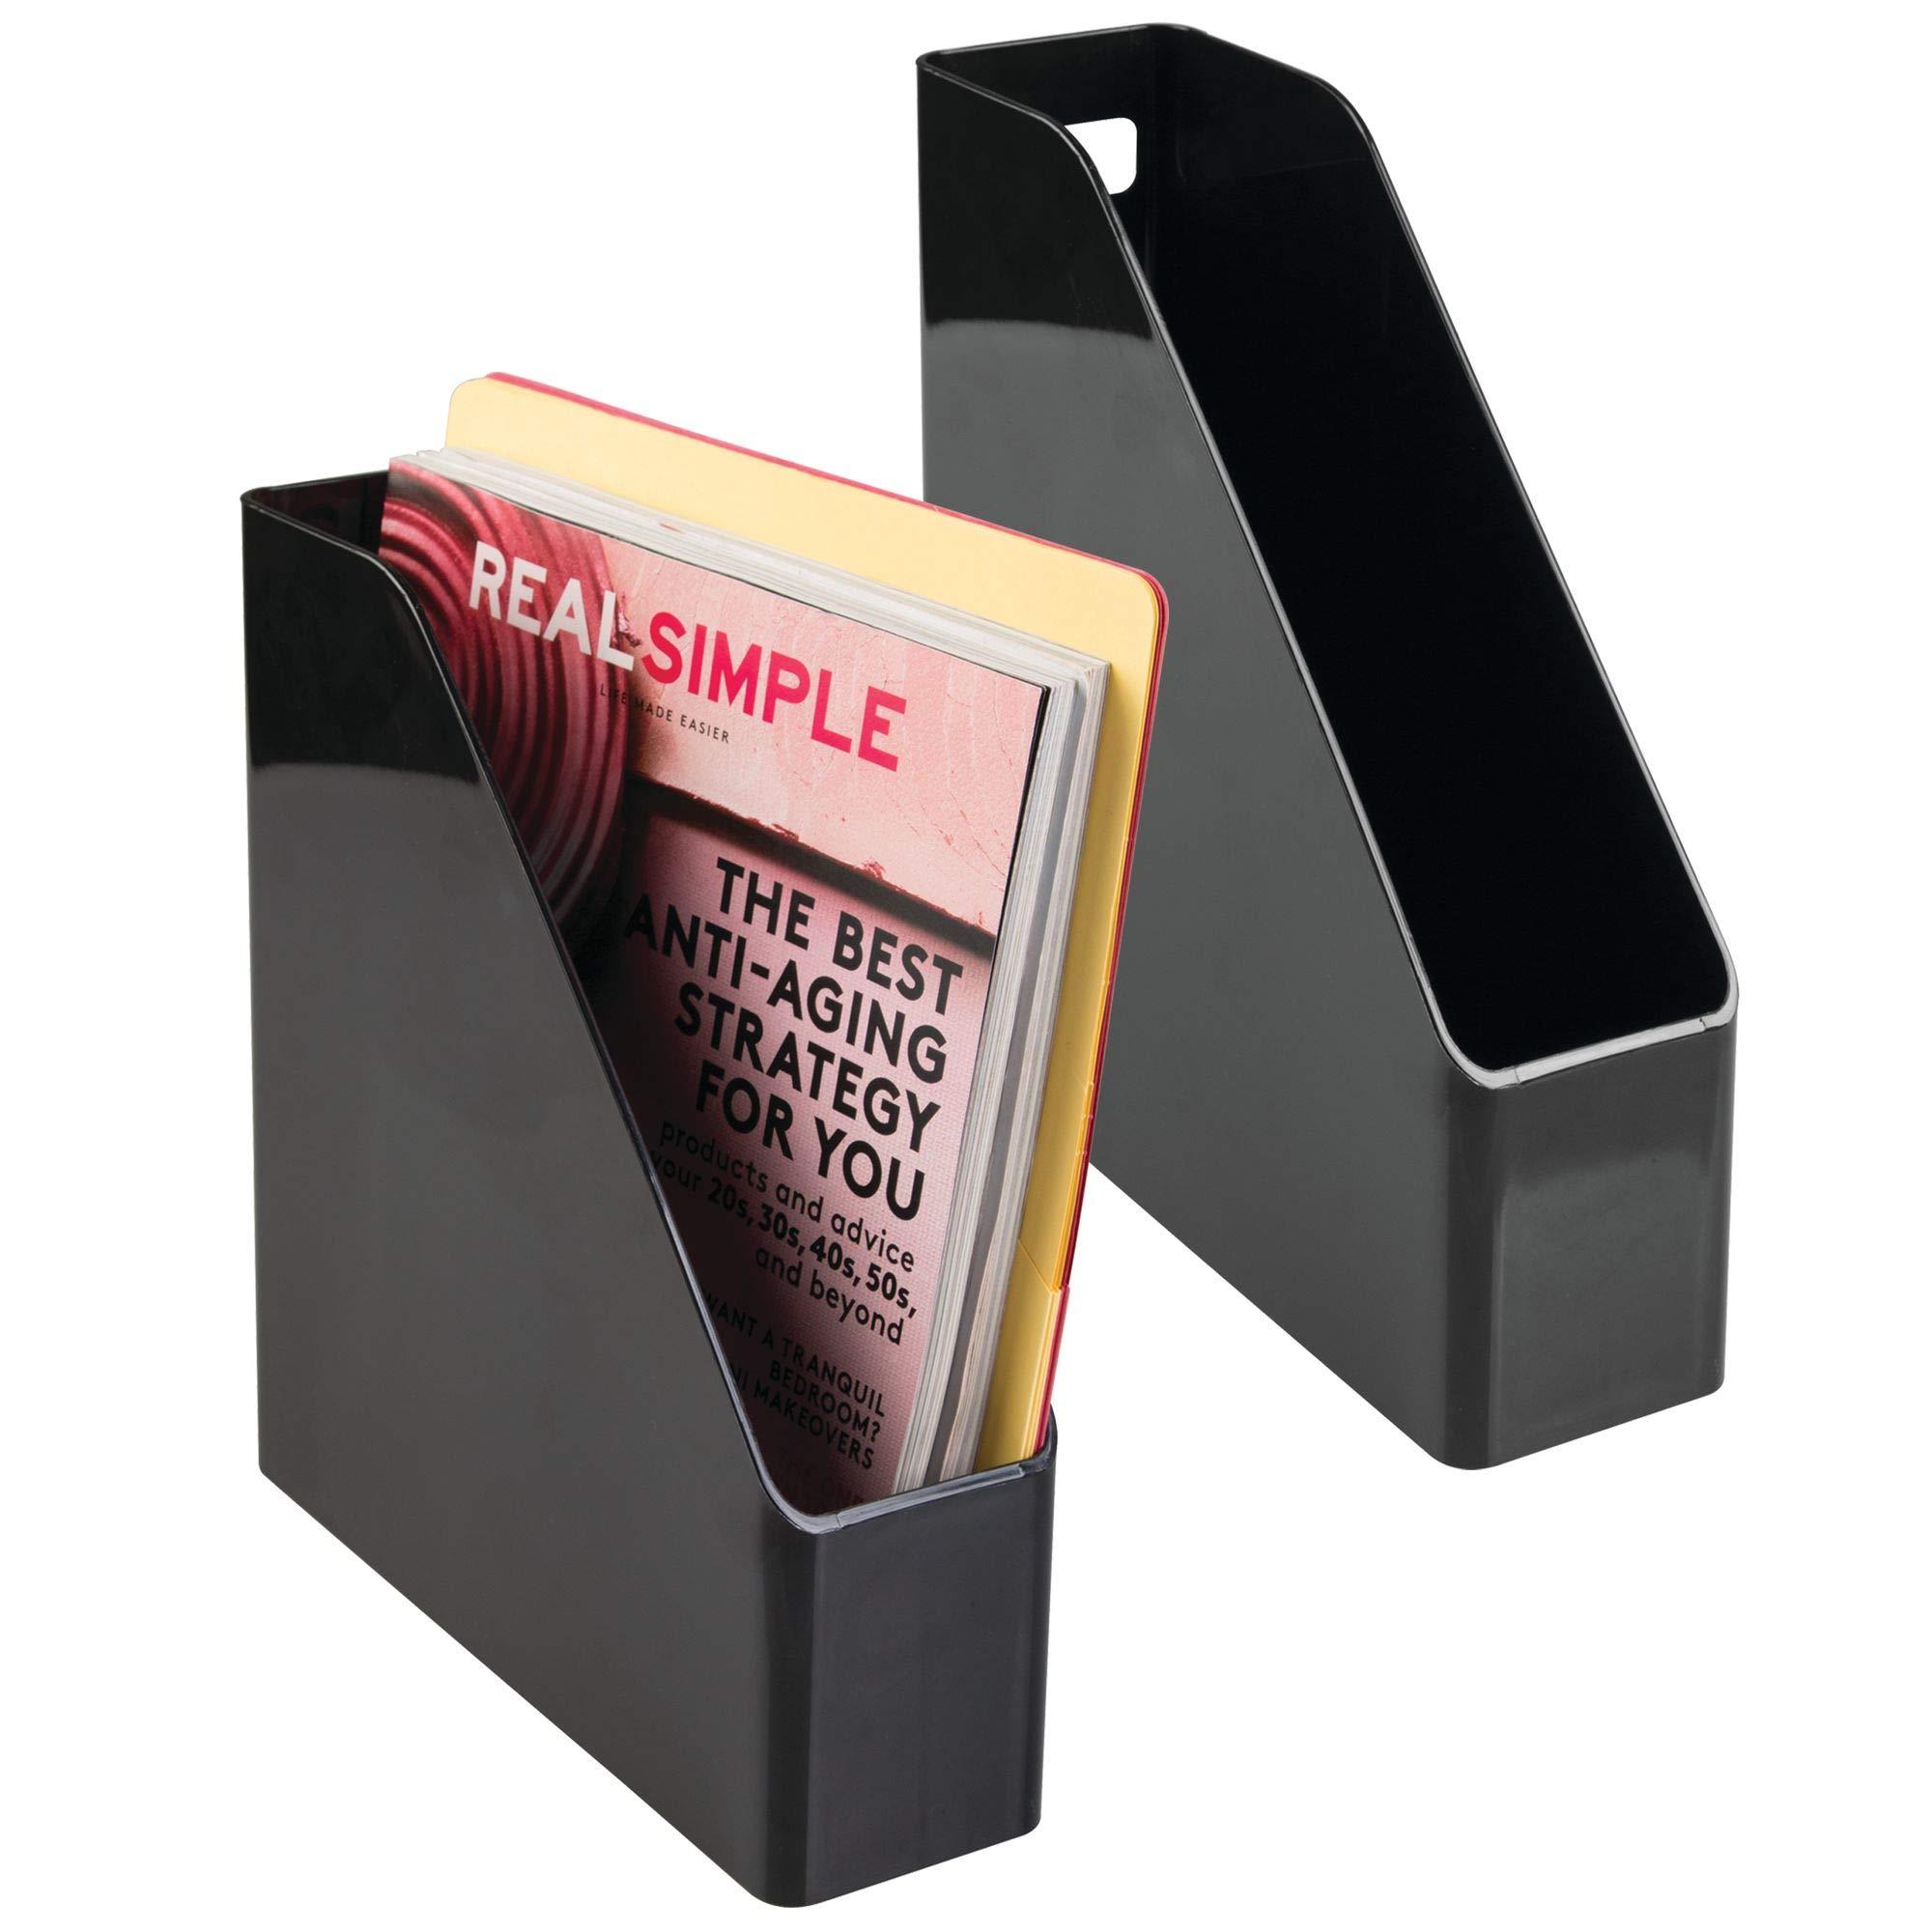 mDesign Plastic File Folder Holders Storage Organizer Set - Vertical with Handle - Holds Notebooks, Binders, Envelopes, Magazines - Home Office and Work Desktops, 2 Pack - Black